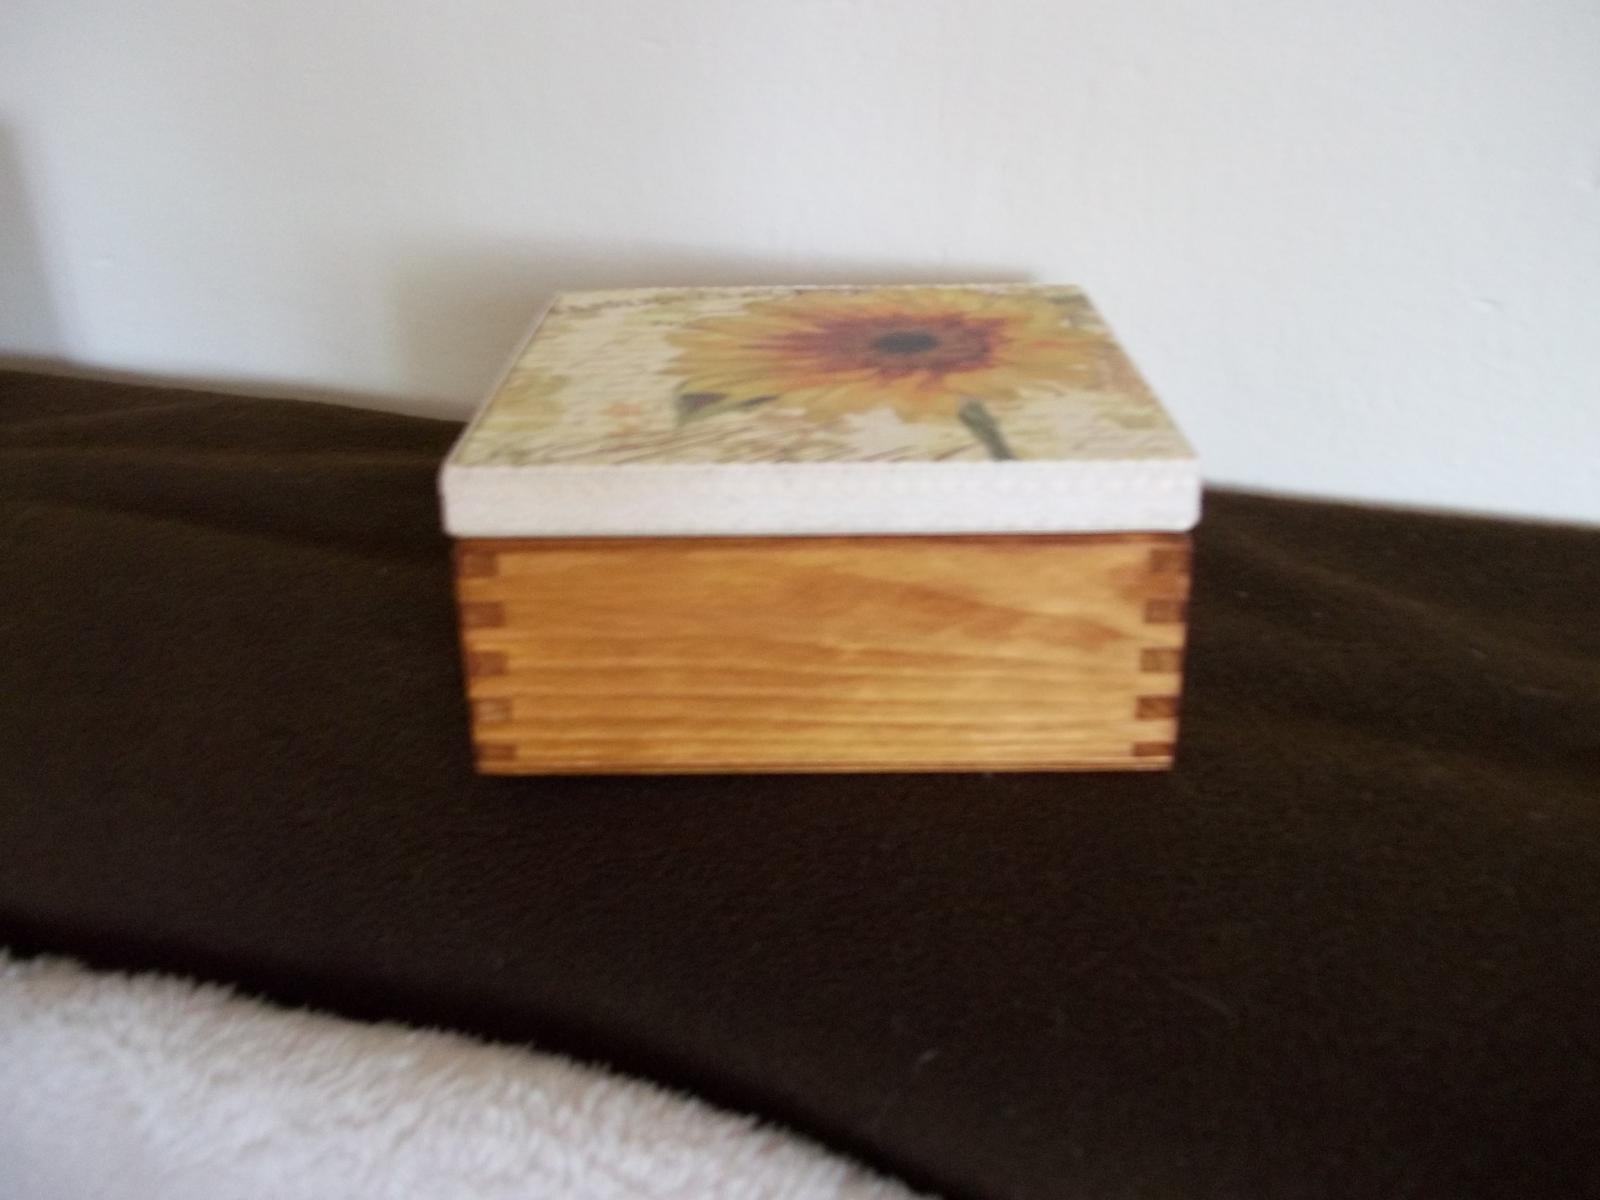 Drevená dekoračná krabička - Obrázok č. 3